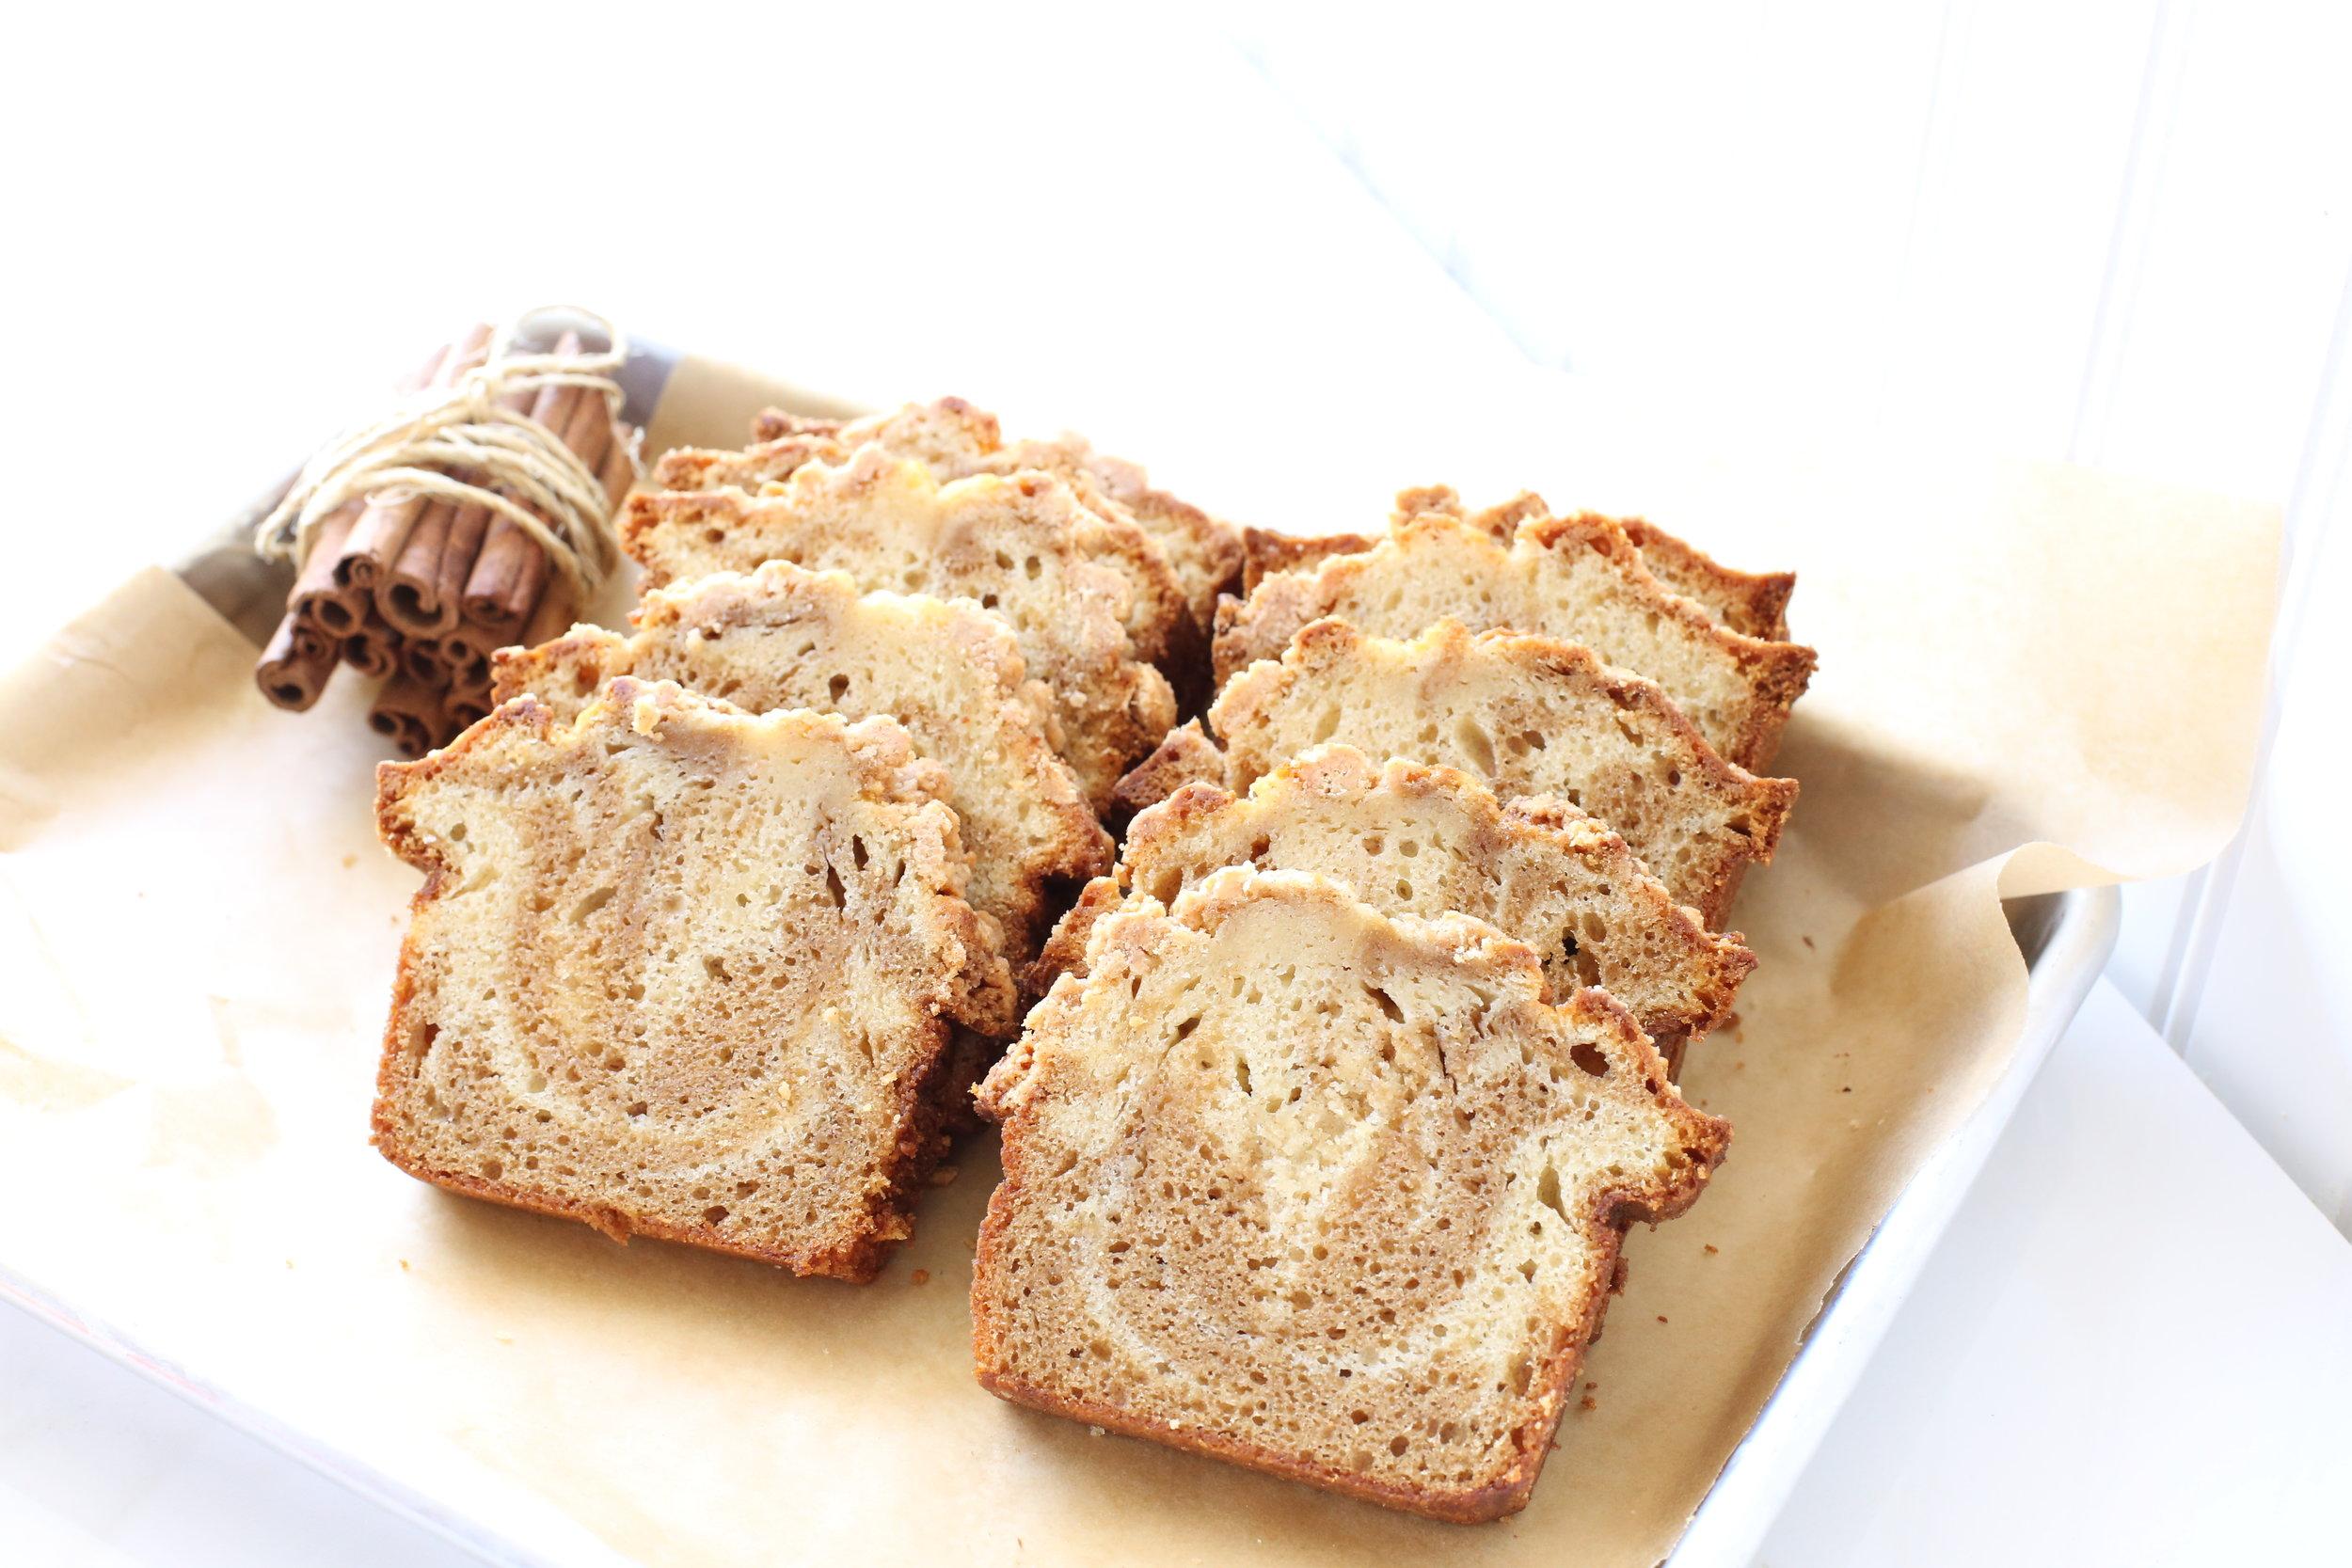 Mrs. Wonderful's Cakes™ - Cinnamon Swirl Sliced Loaf Cake